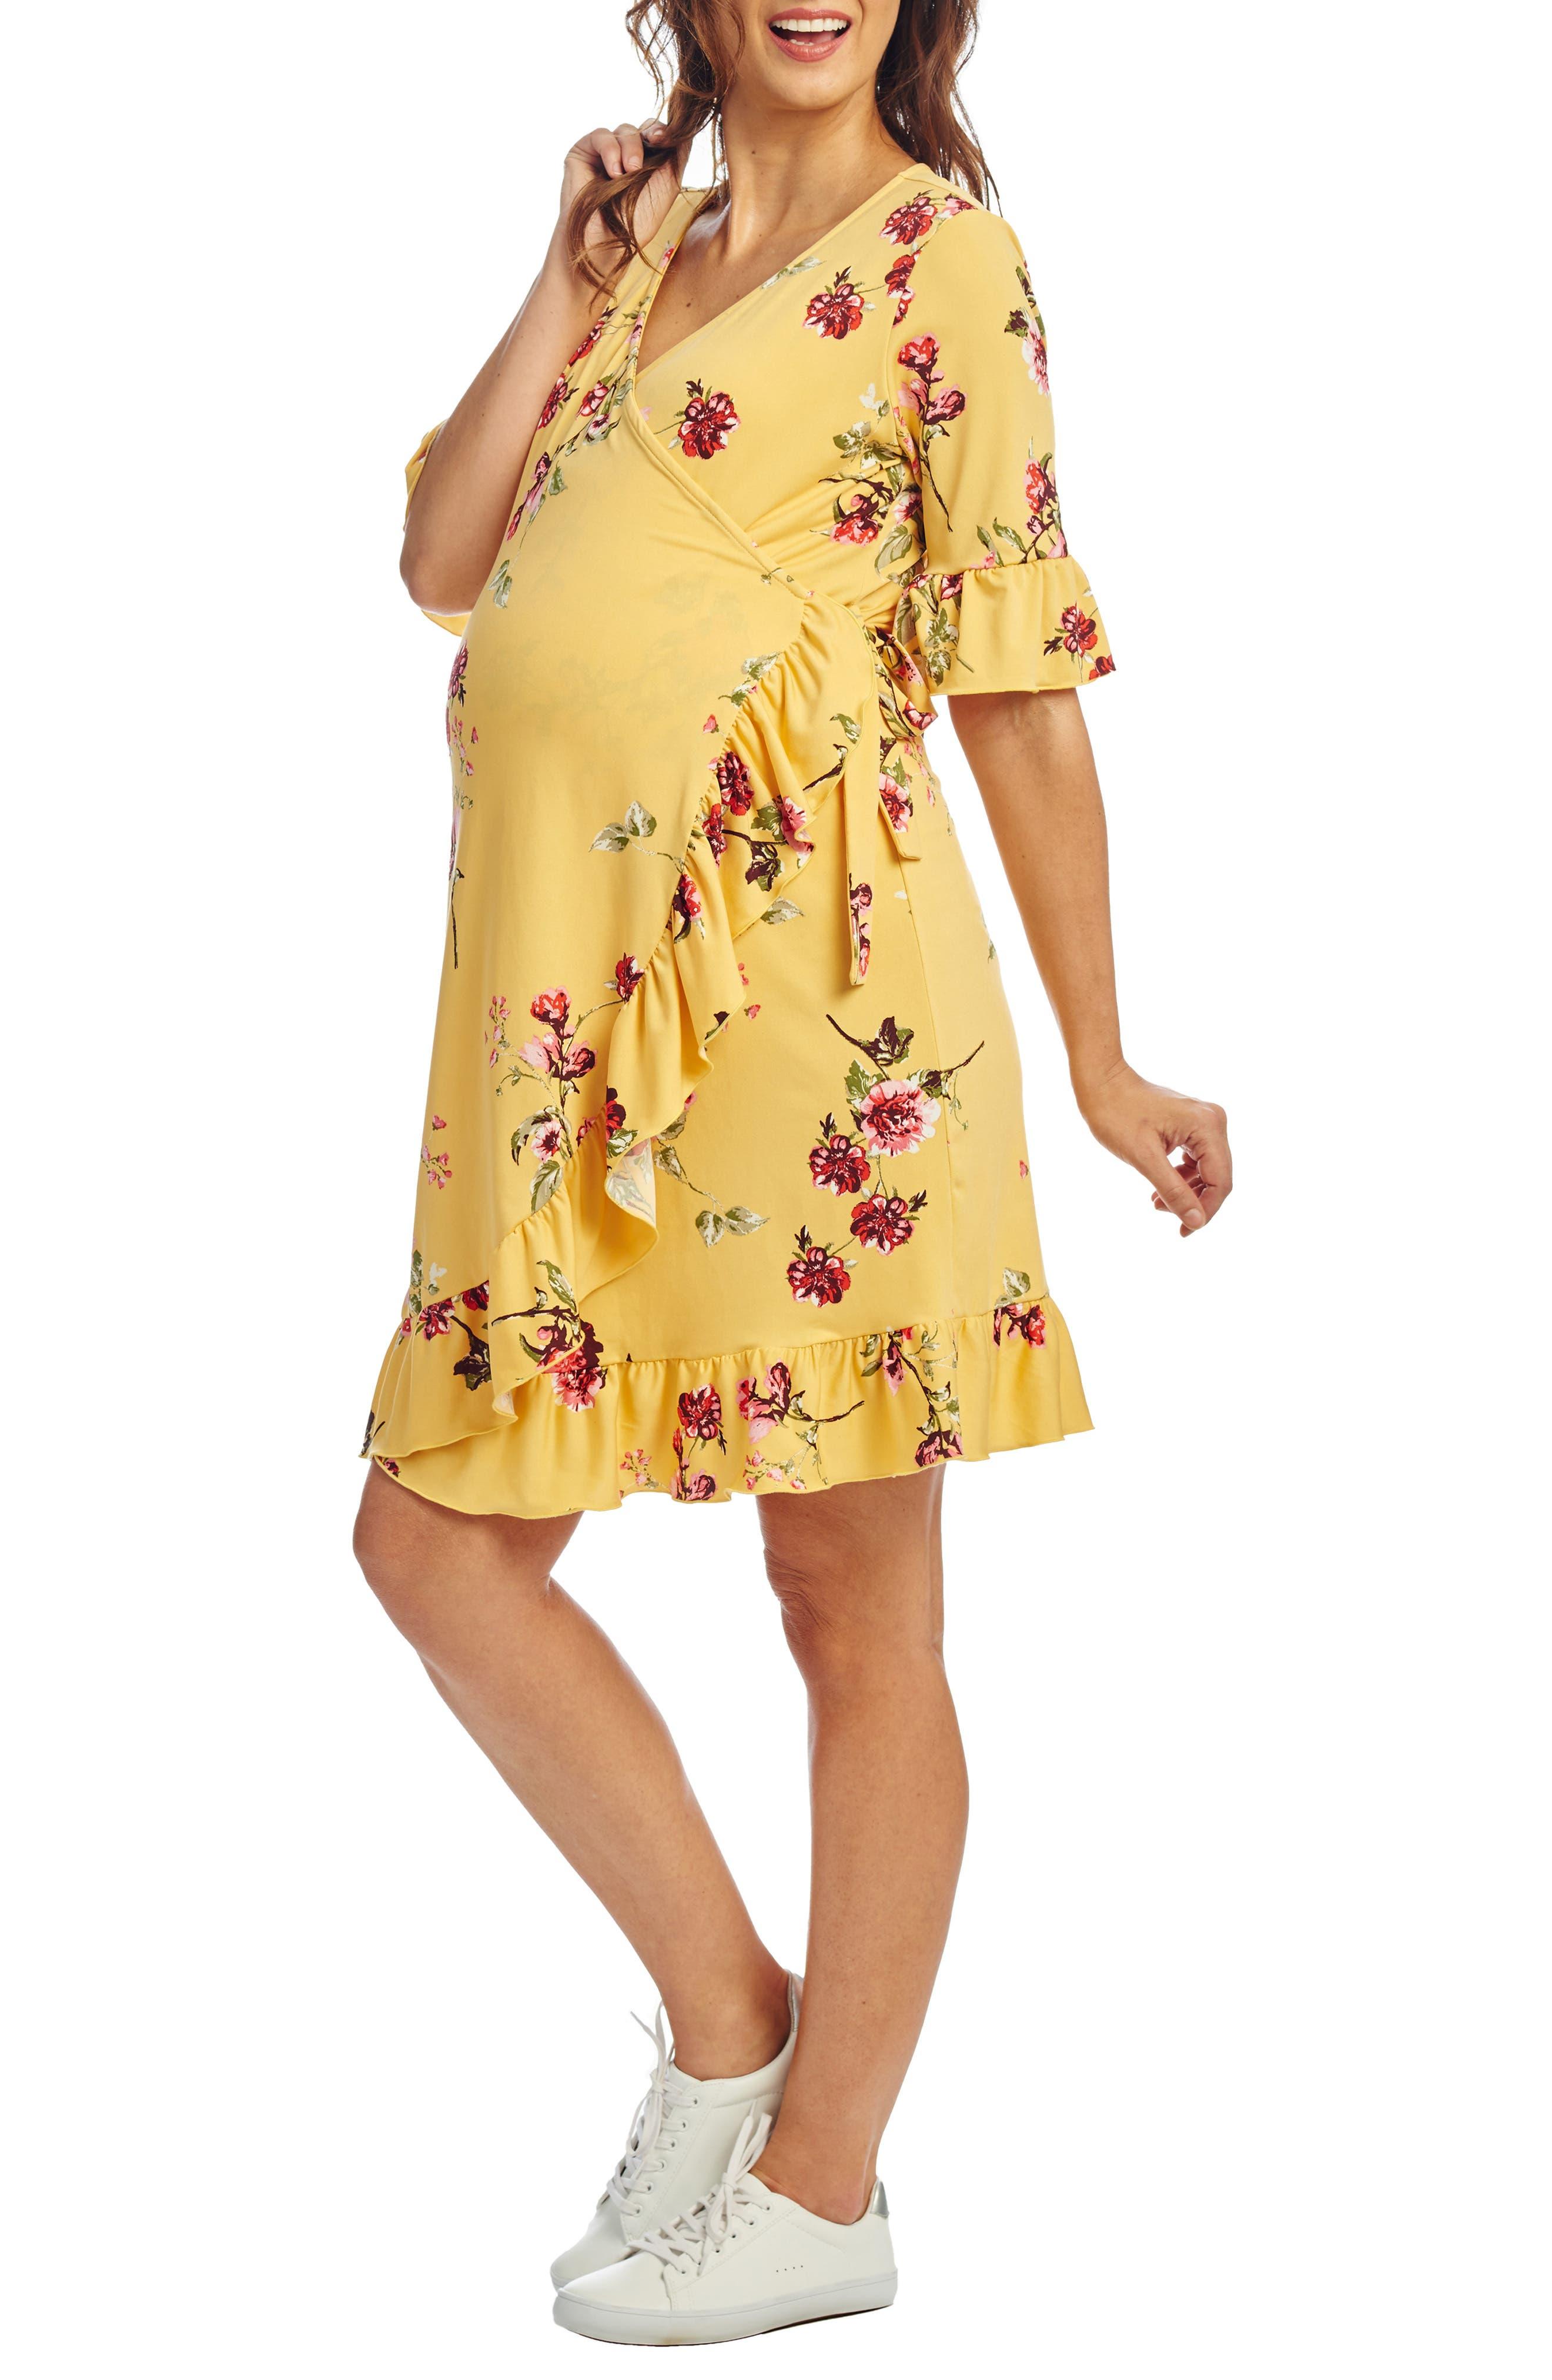 Everly Grey Leilani Maternity/nursing Wrap Dress, Yellow